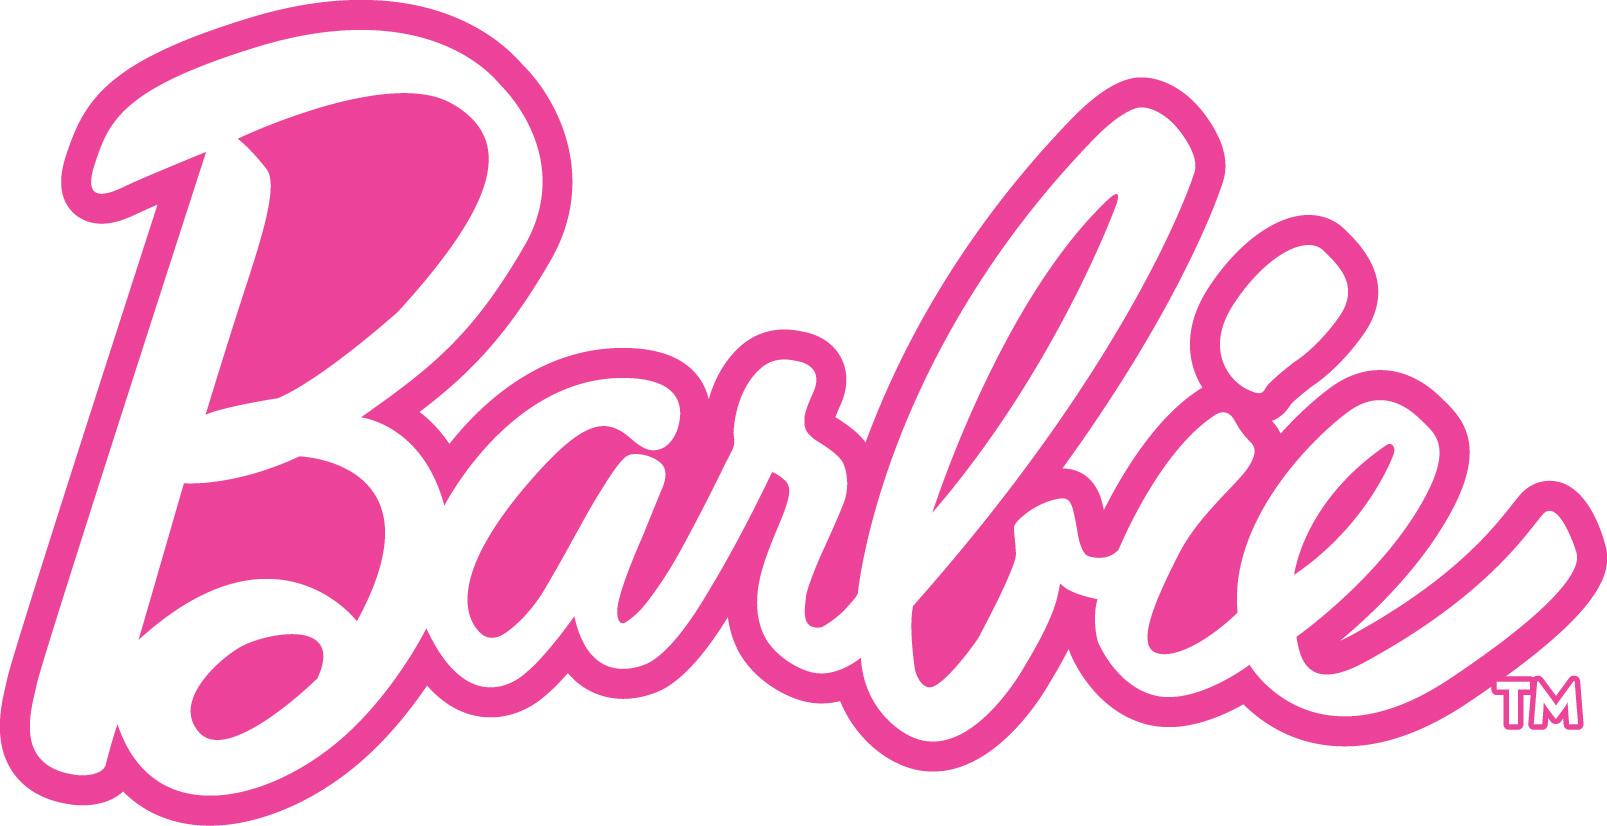 Barbie Silhouette Svg At Getdrawings Free Download